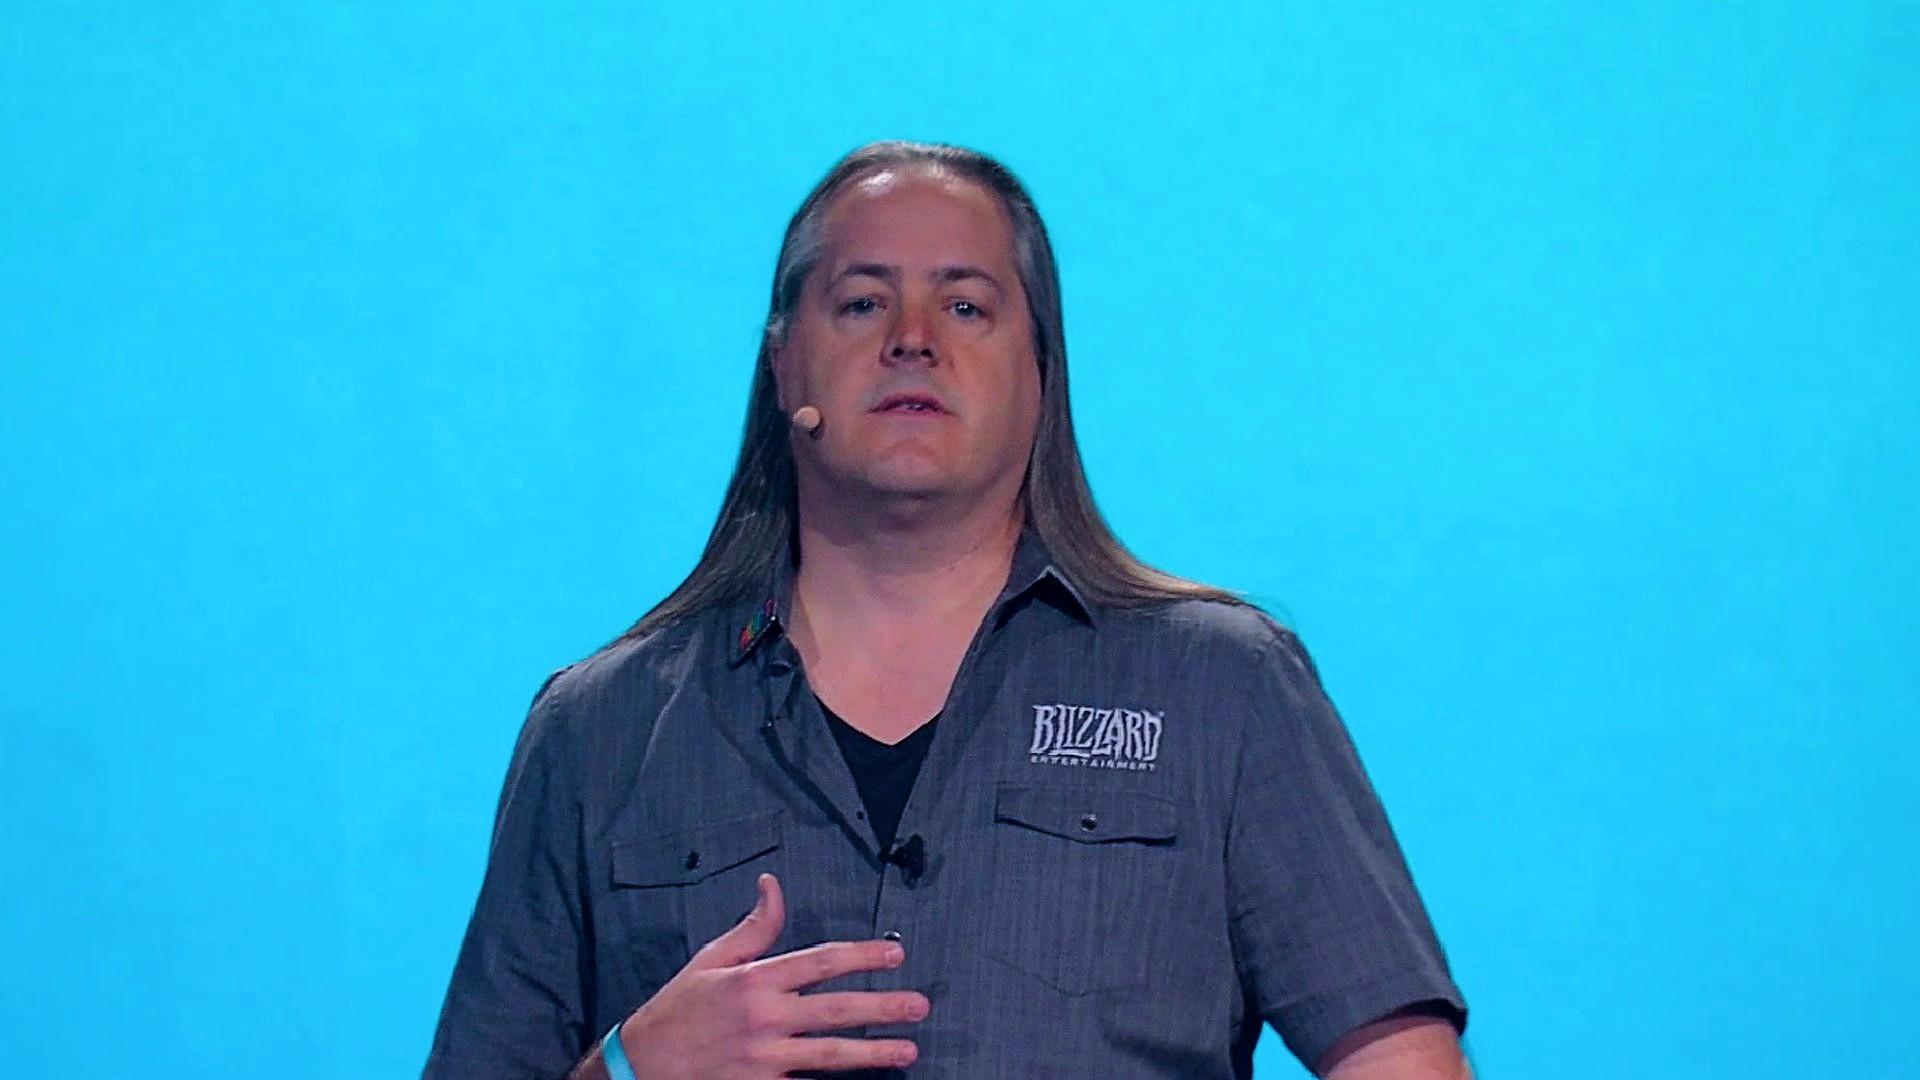 Blizzard president J. Allen Brack is stepping down